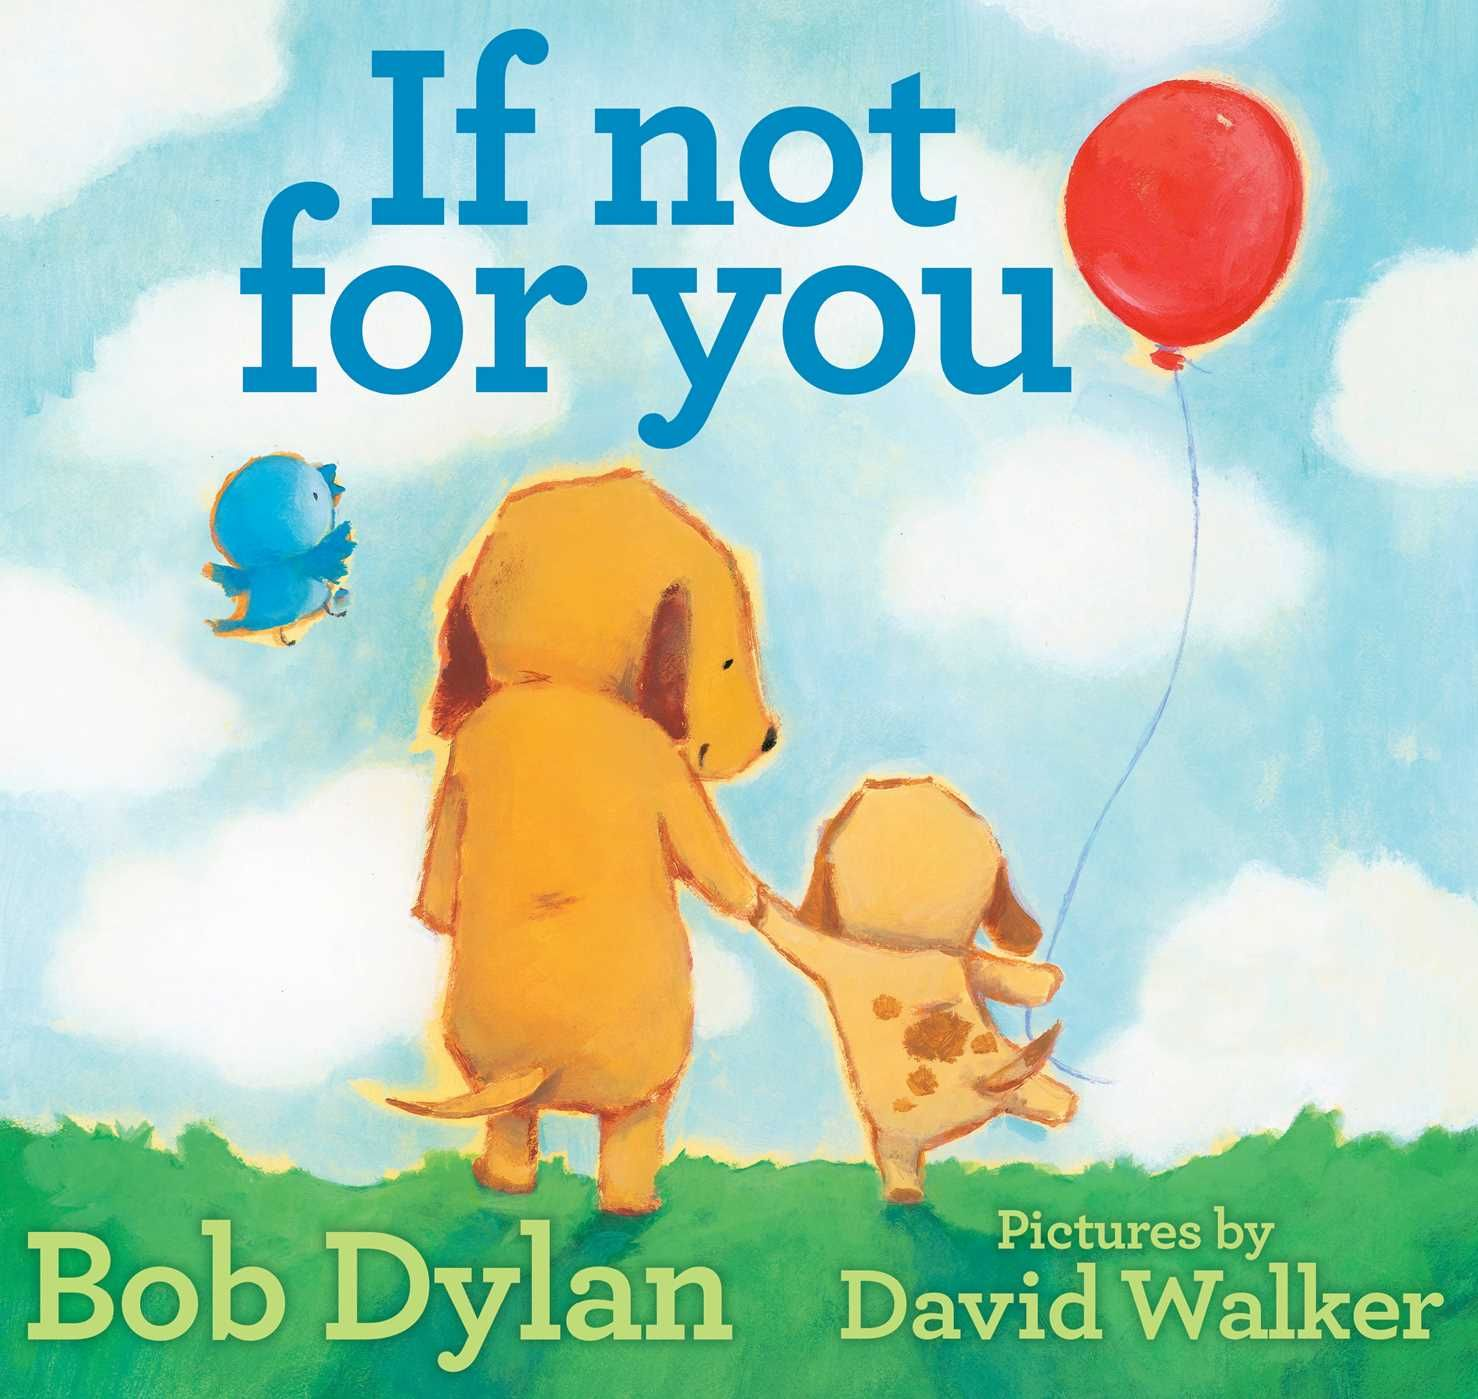 by Bob Dylan and David Walker